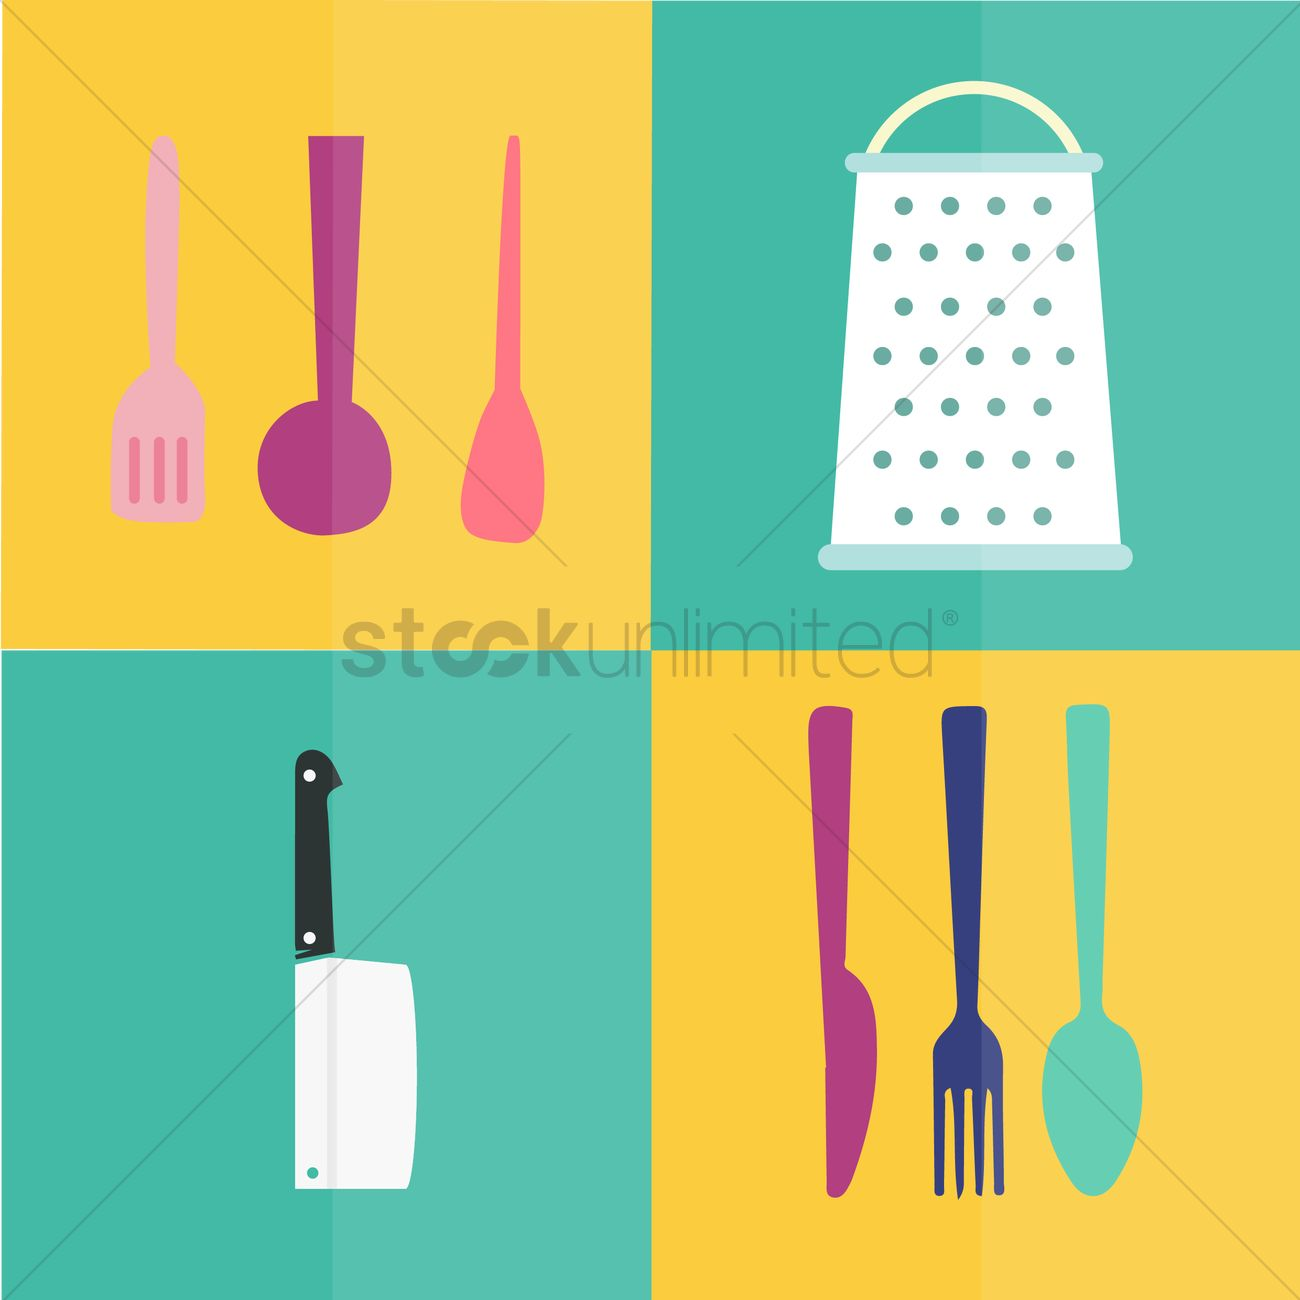 Kitchen utensils Vector Image - 1471735   StockUnlimited